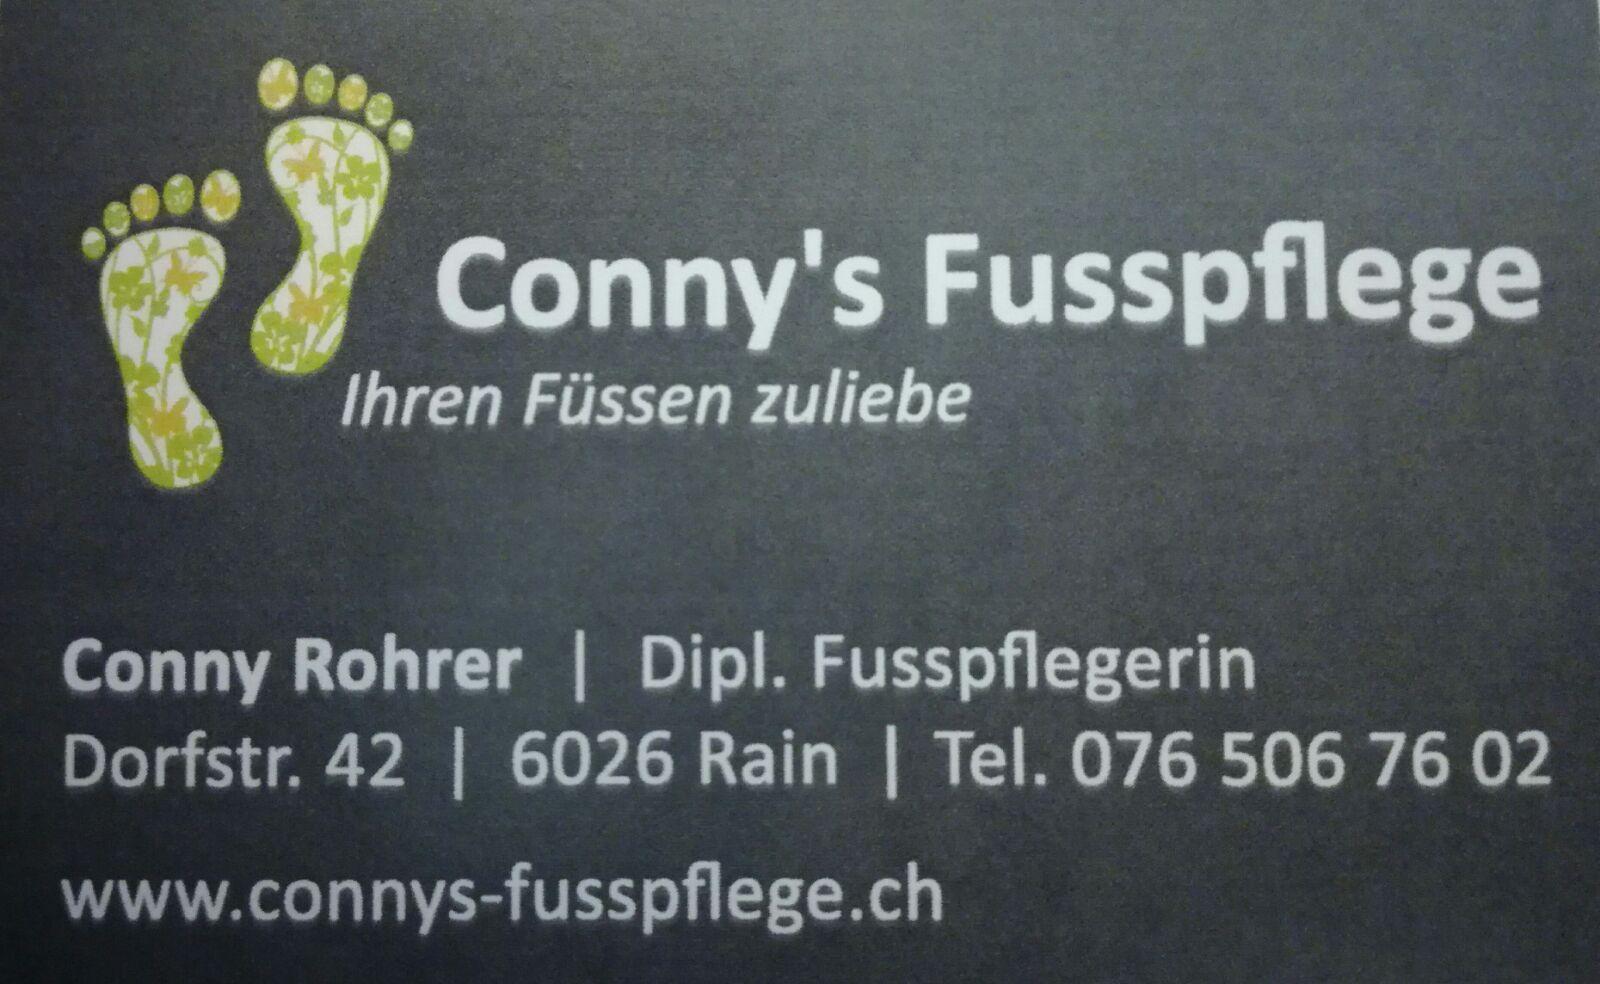 Conny S Fusspflege